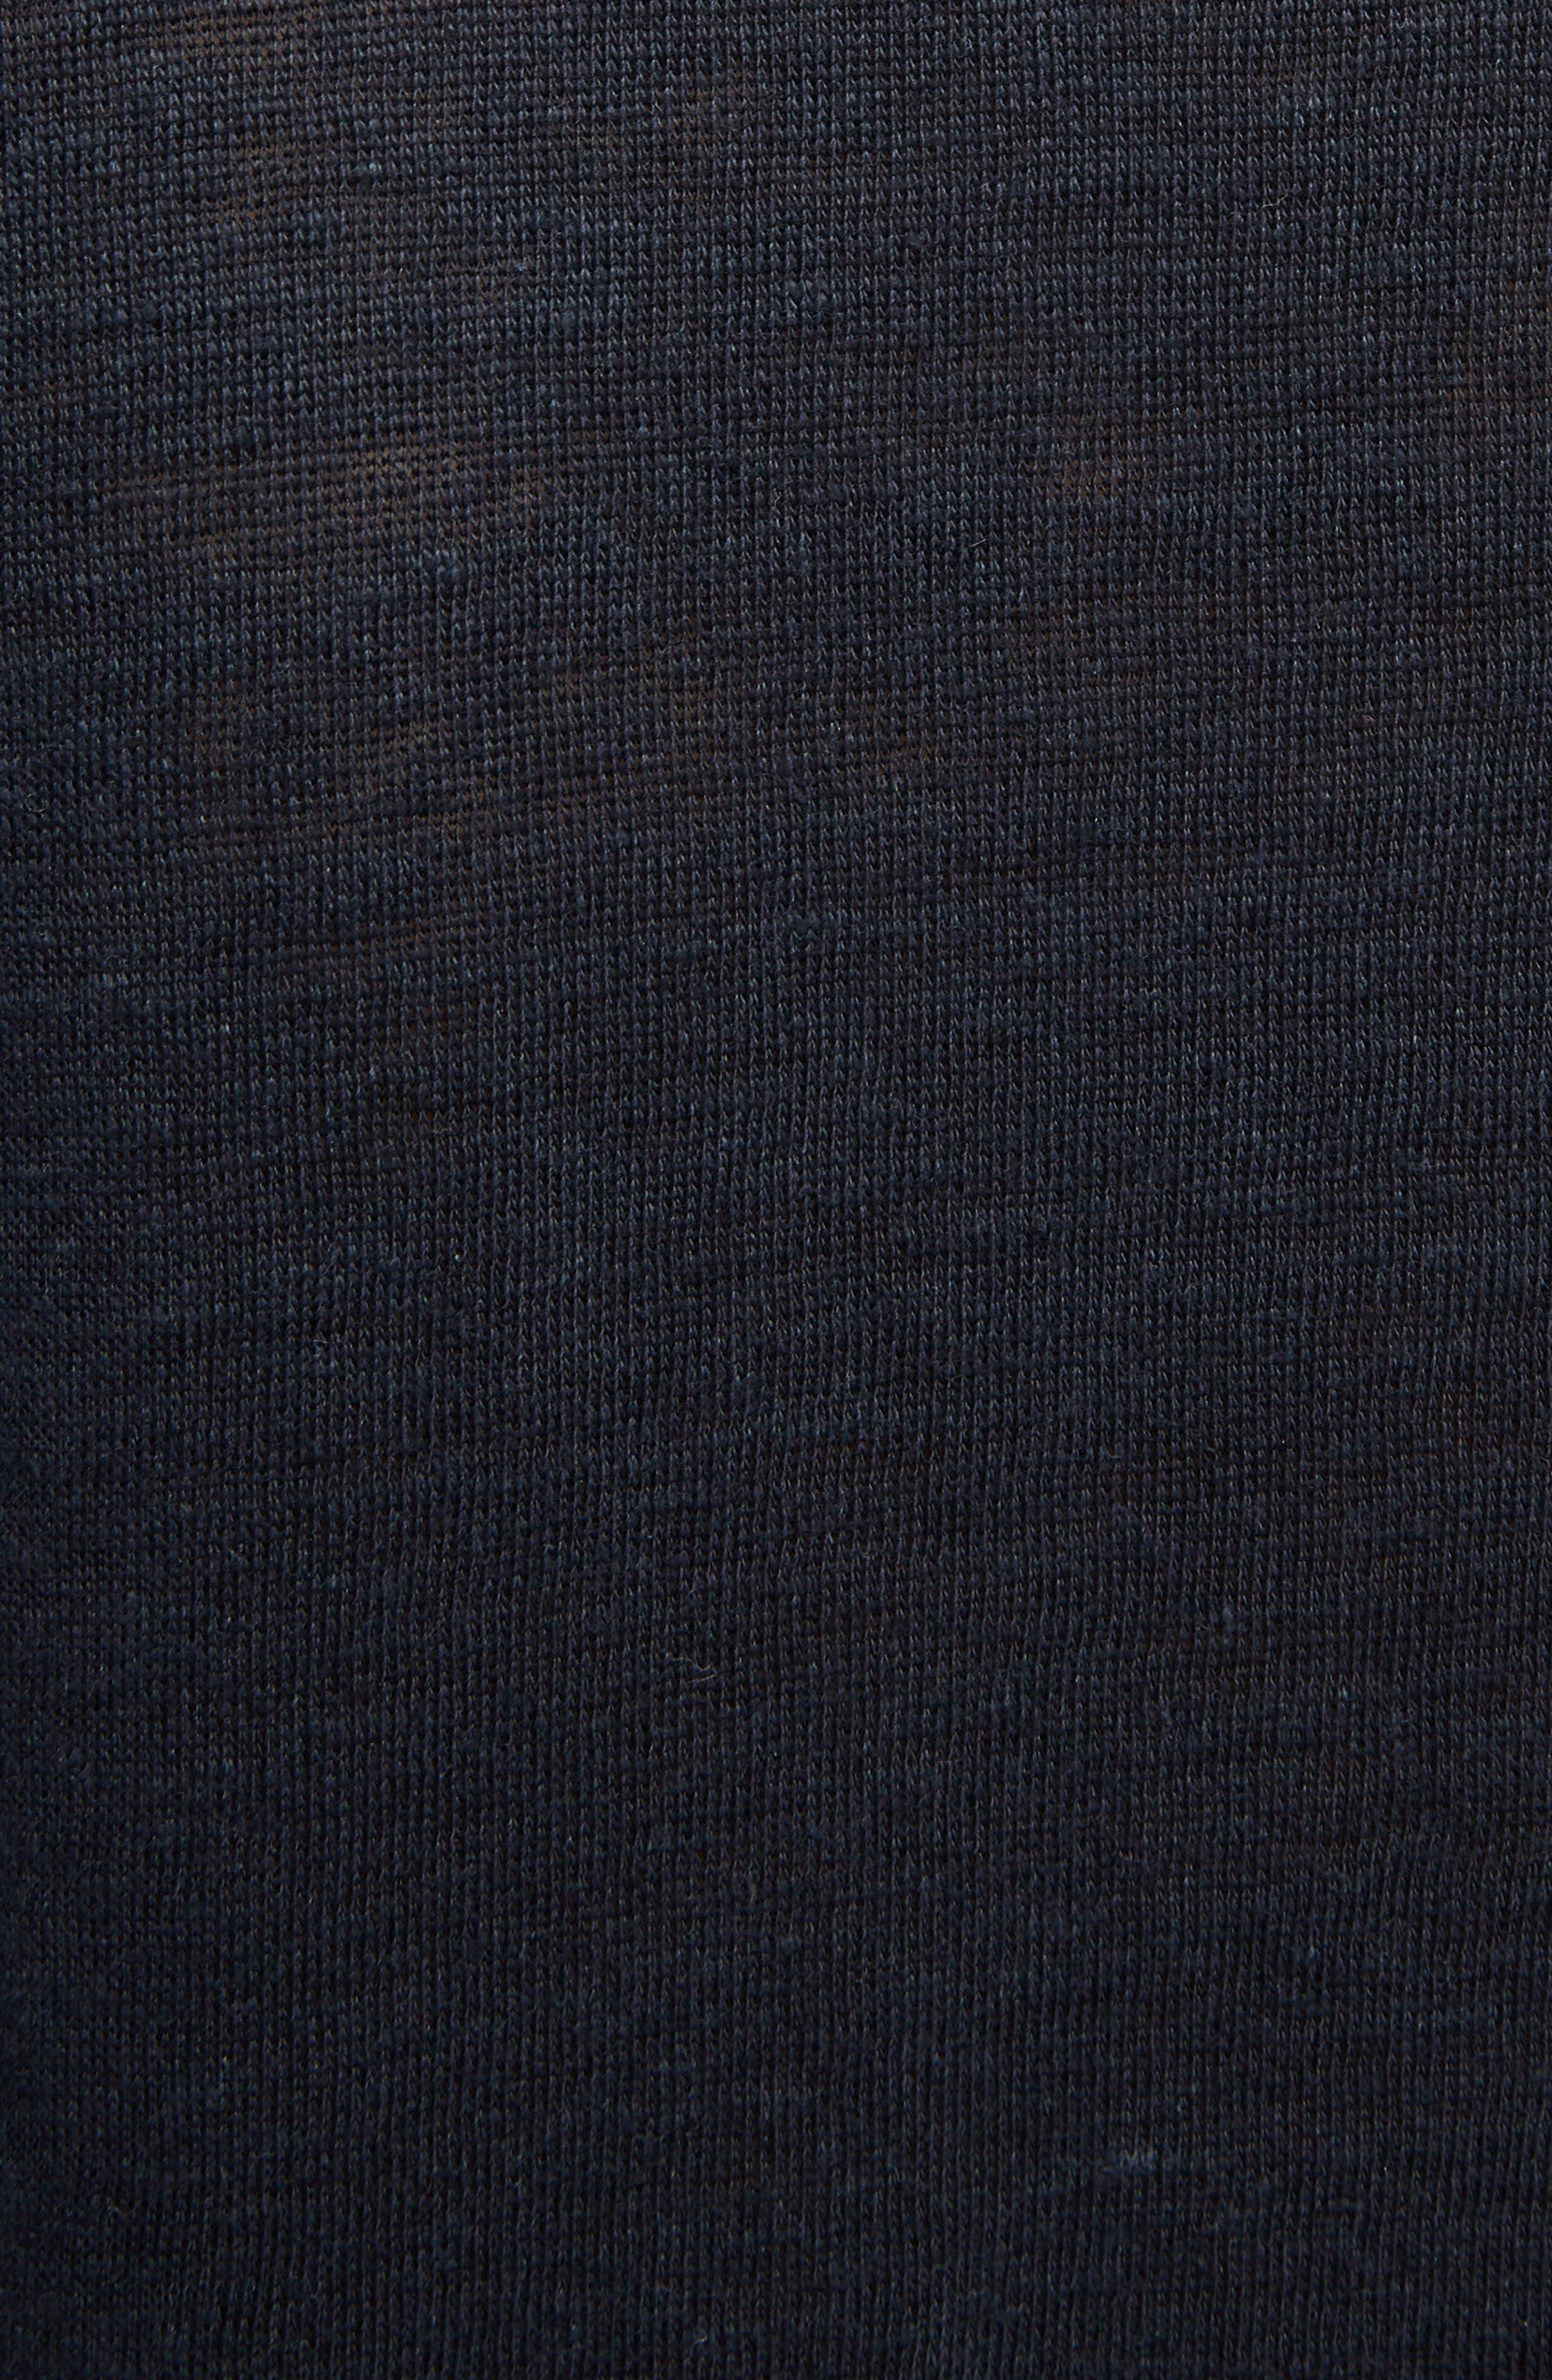 Saga Linen T-Shirt Dress,                             Alternate thumbnail 5, color,                             001